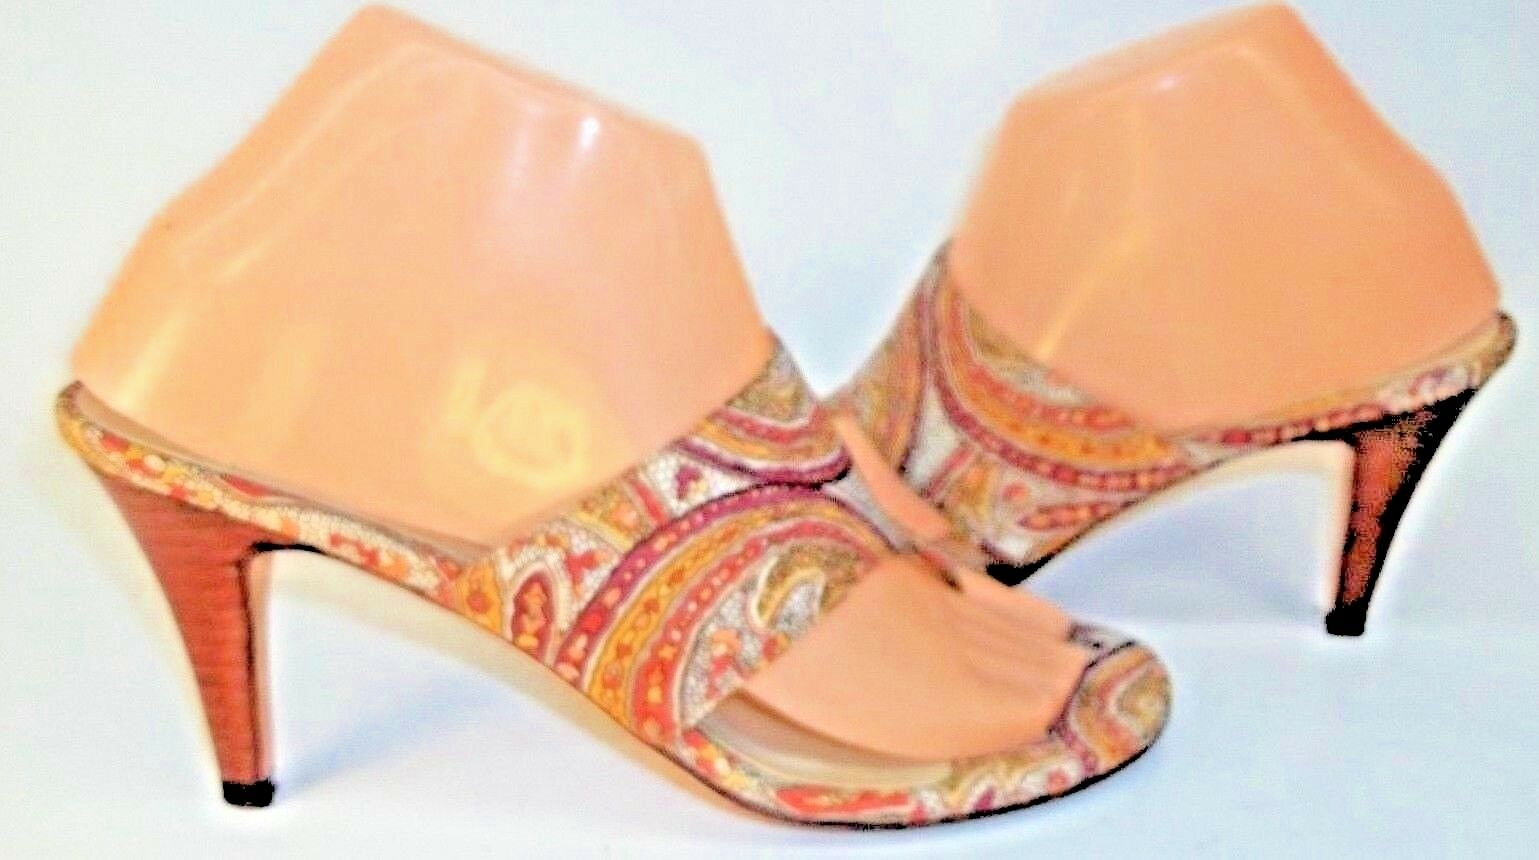 Talbots Mujer Tacones Sandalias Tela de EE. UU. 7.5 Cuero Tela Sandalias Geométrico Resort Zapatos 3288 19e8d9